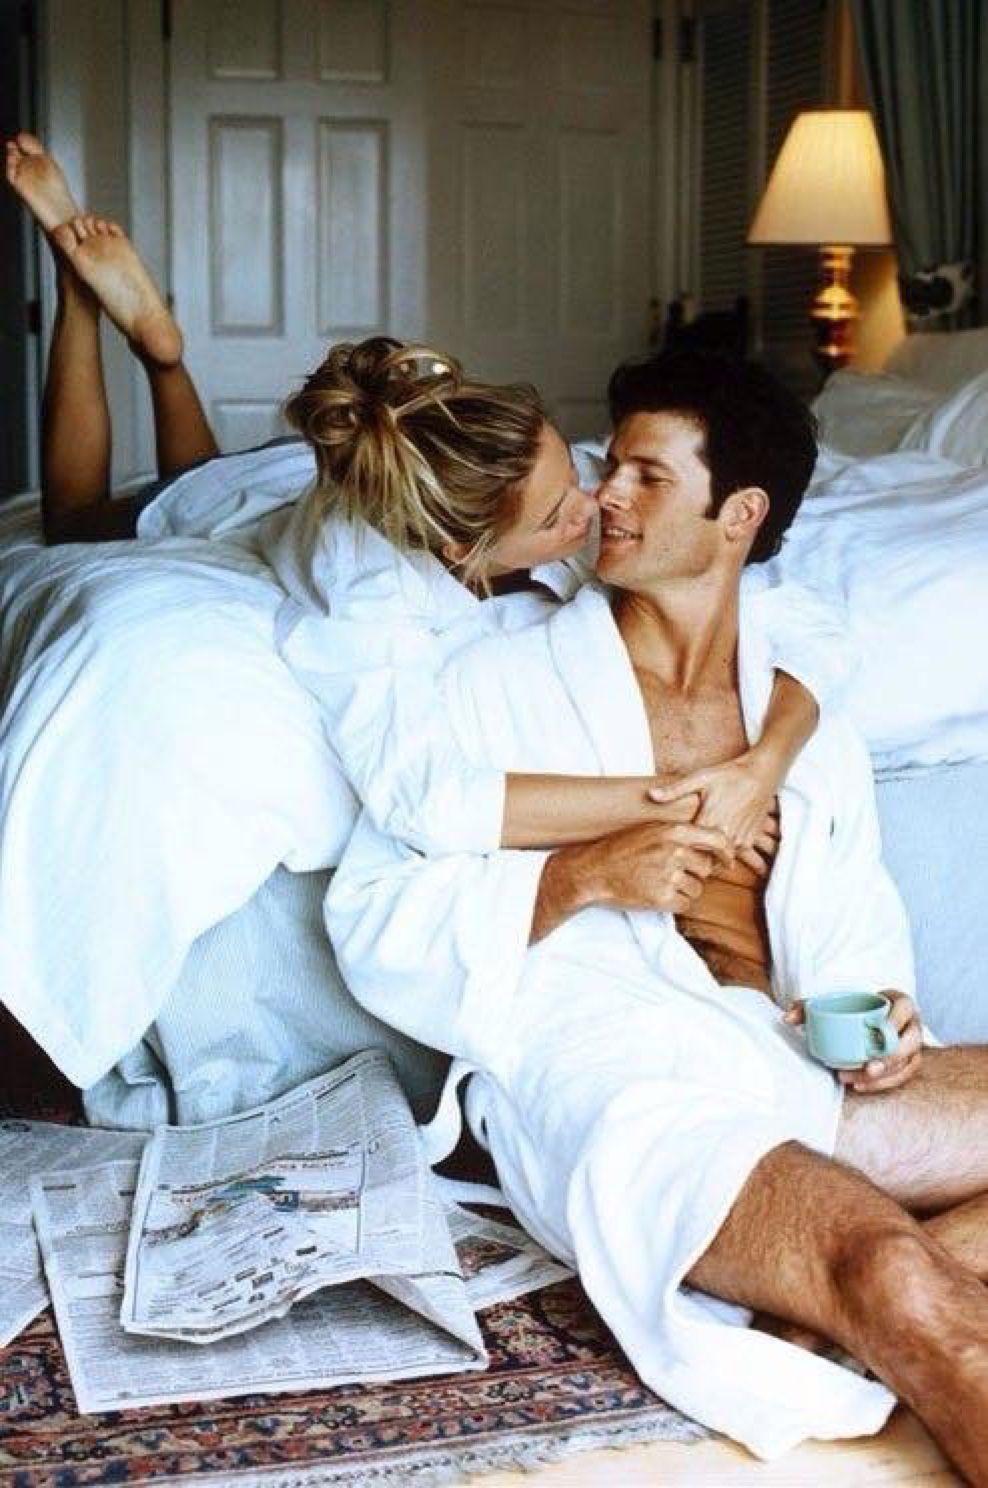 moments like this | sunday morning mood | couple goals | love | romance | Fitz & Huxley | www.fitzandhuxley.com